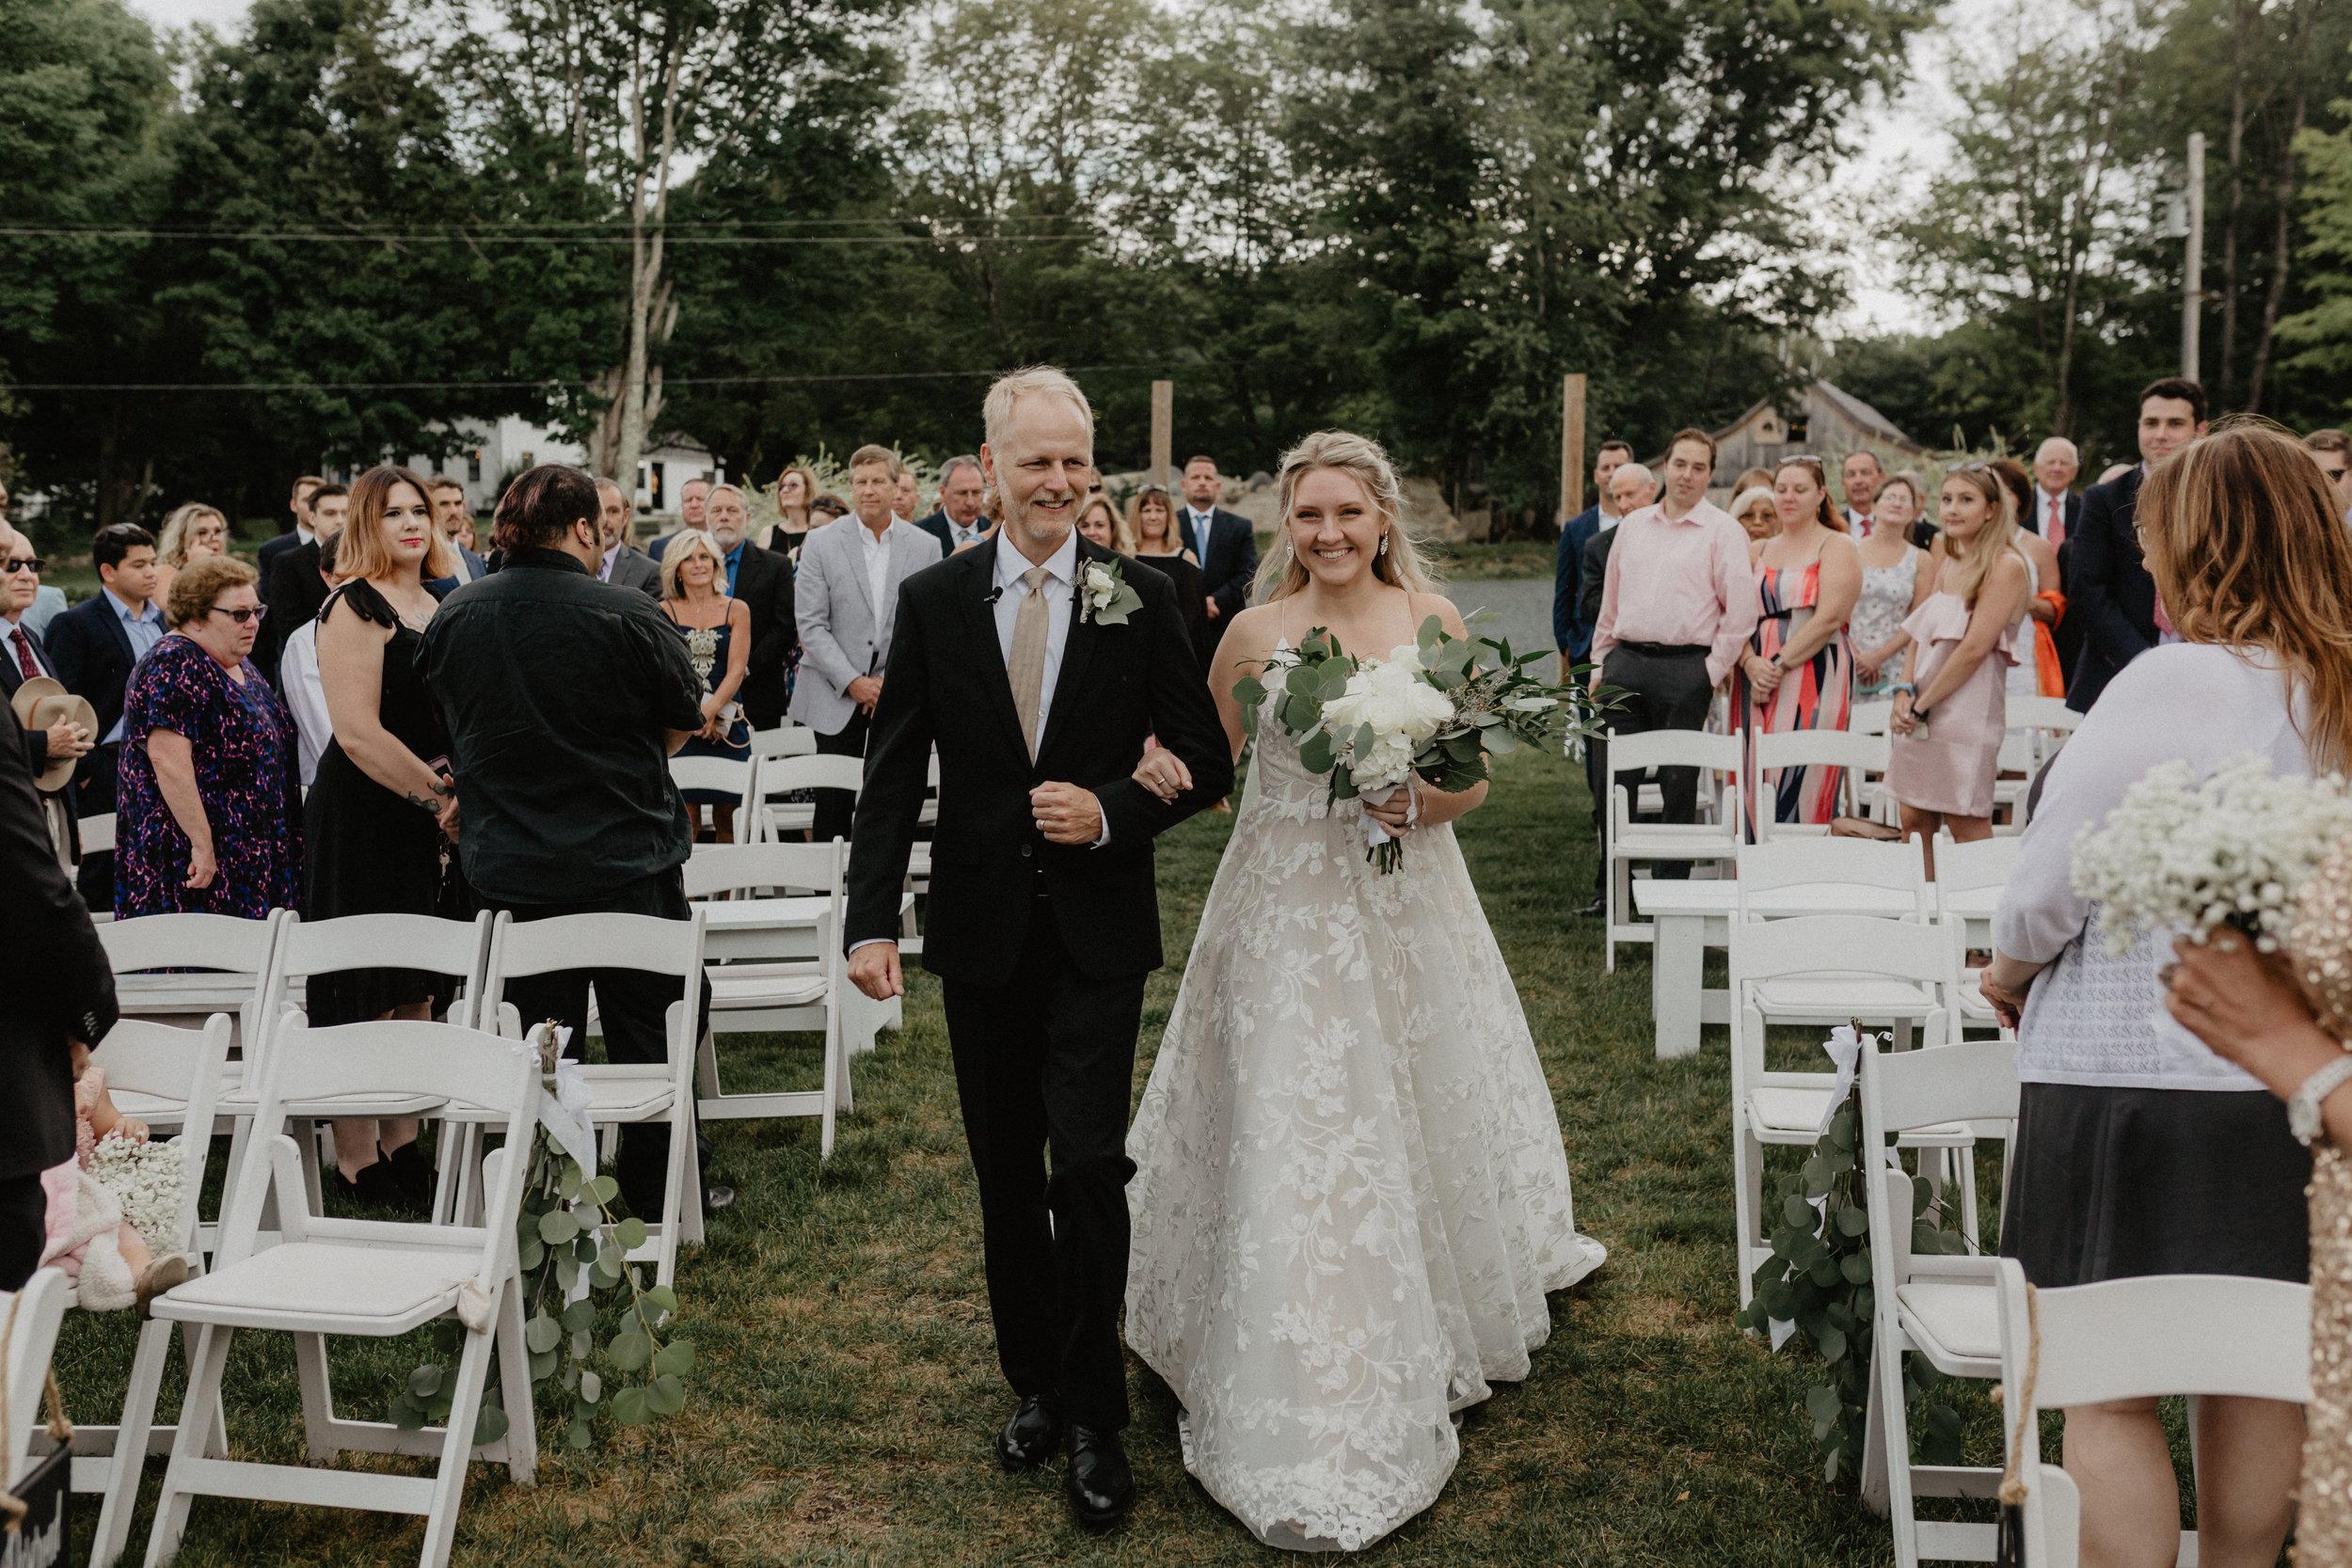 greywacke-meadows-wedding-26.jpg